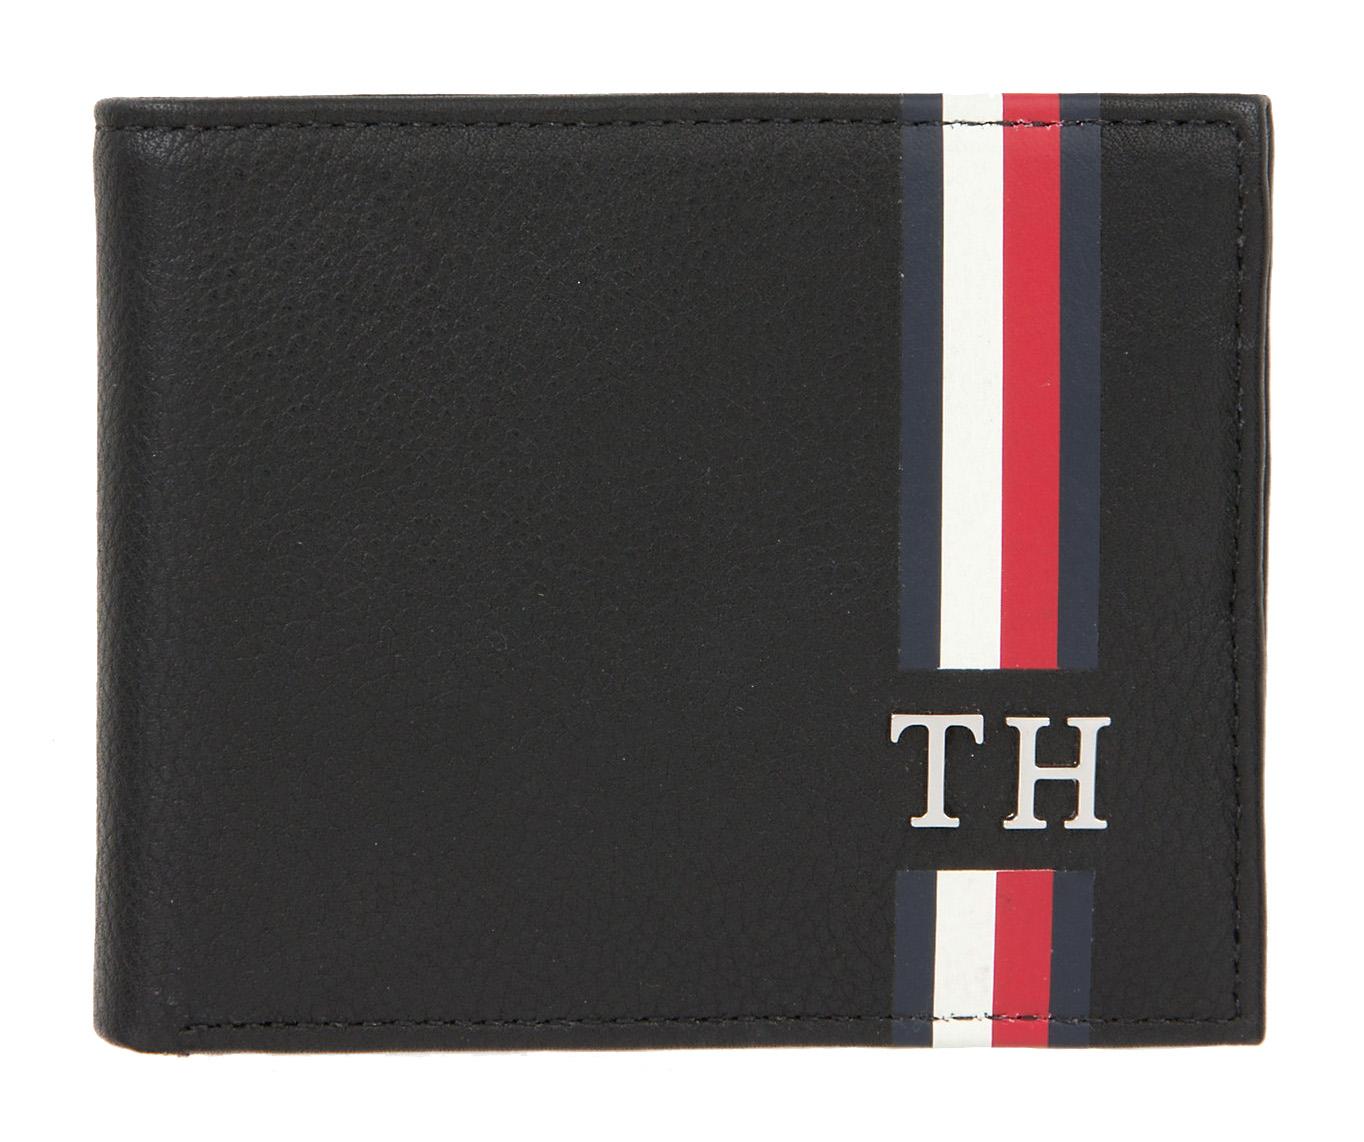 645148676062 Tommy Hilfiger Corporate CC Wallet W MNY C AM0AM04556 002 Μαυρο (Μαύρο)